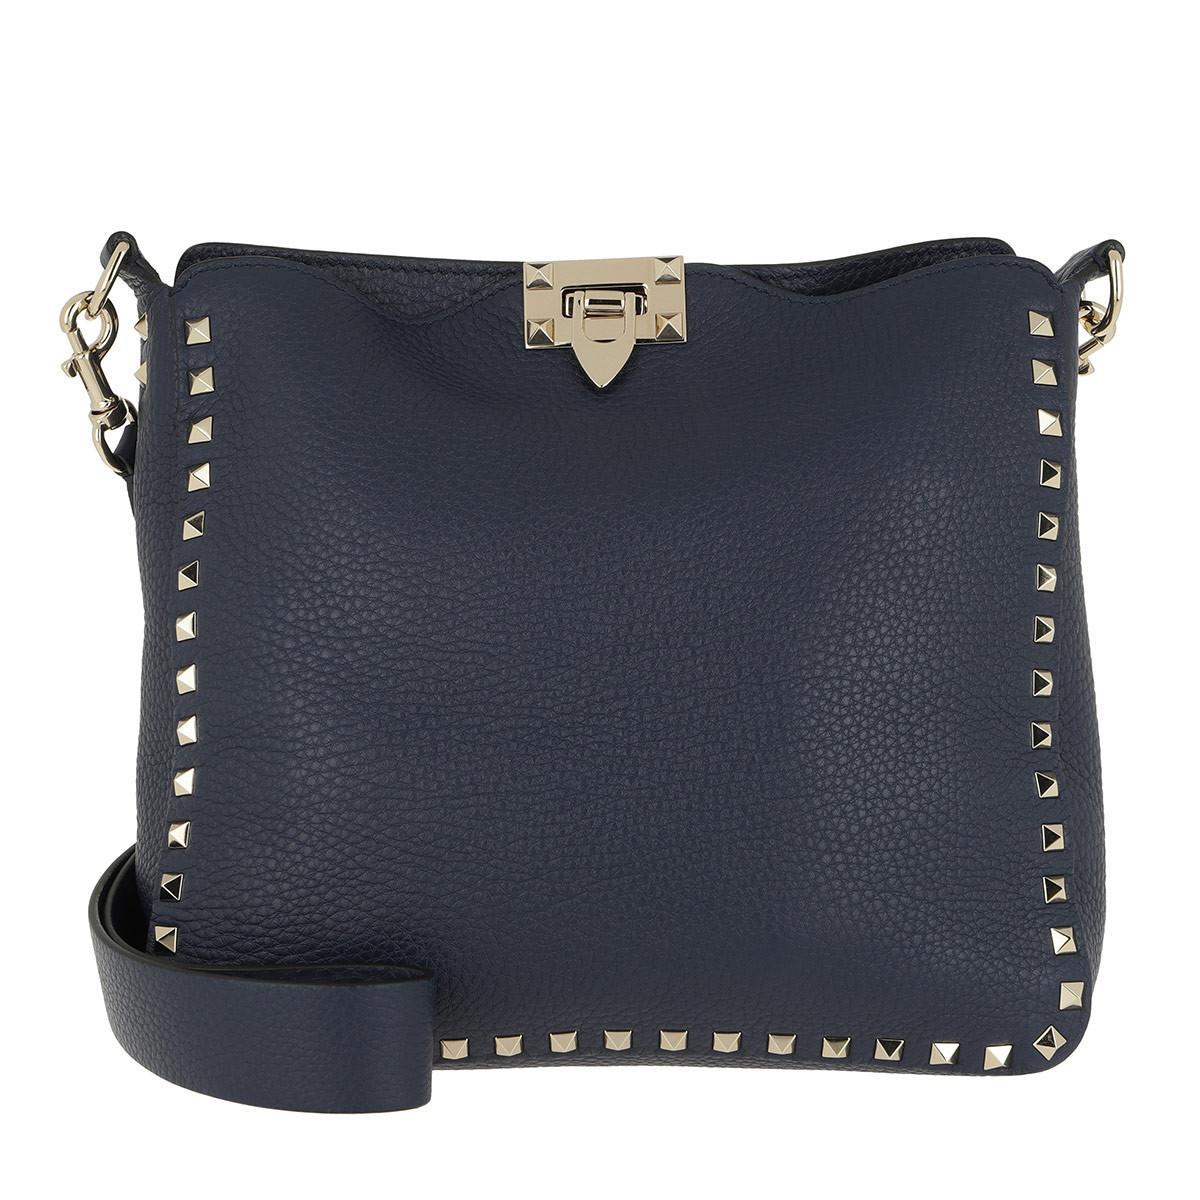 302b631ed6 Valentino Rockstud Nappa Messenger Bag Pure Blue in Blue - Lyst